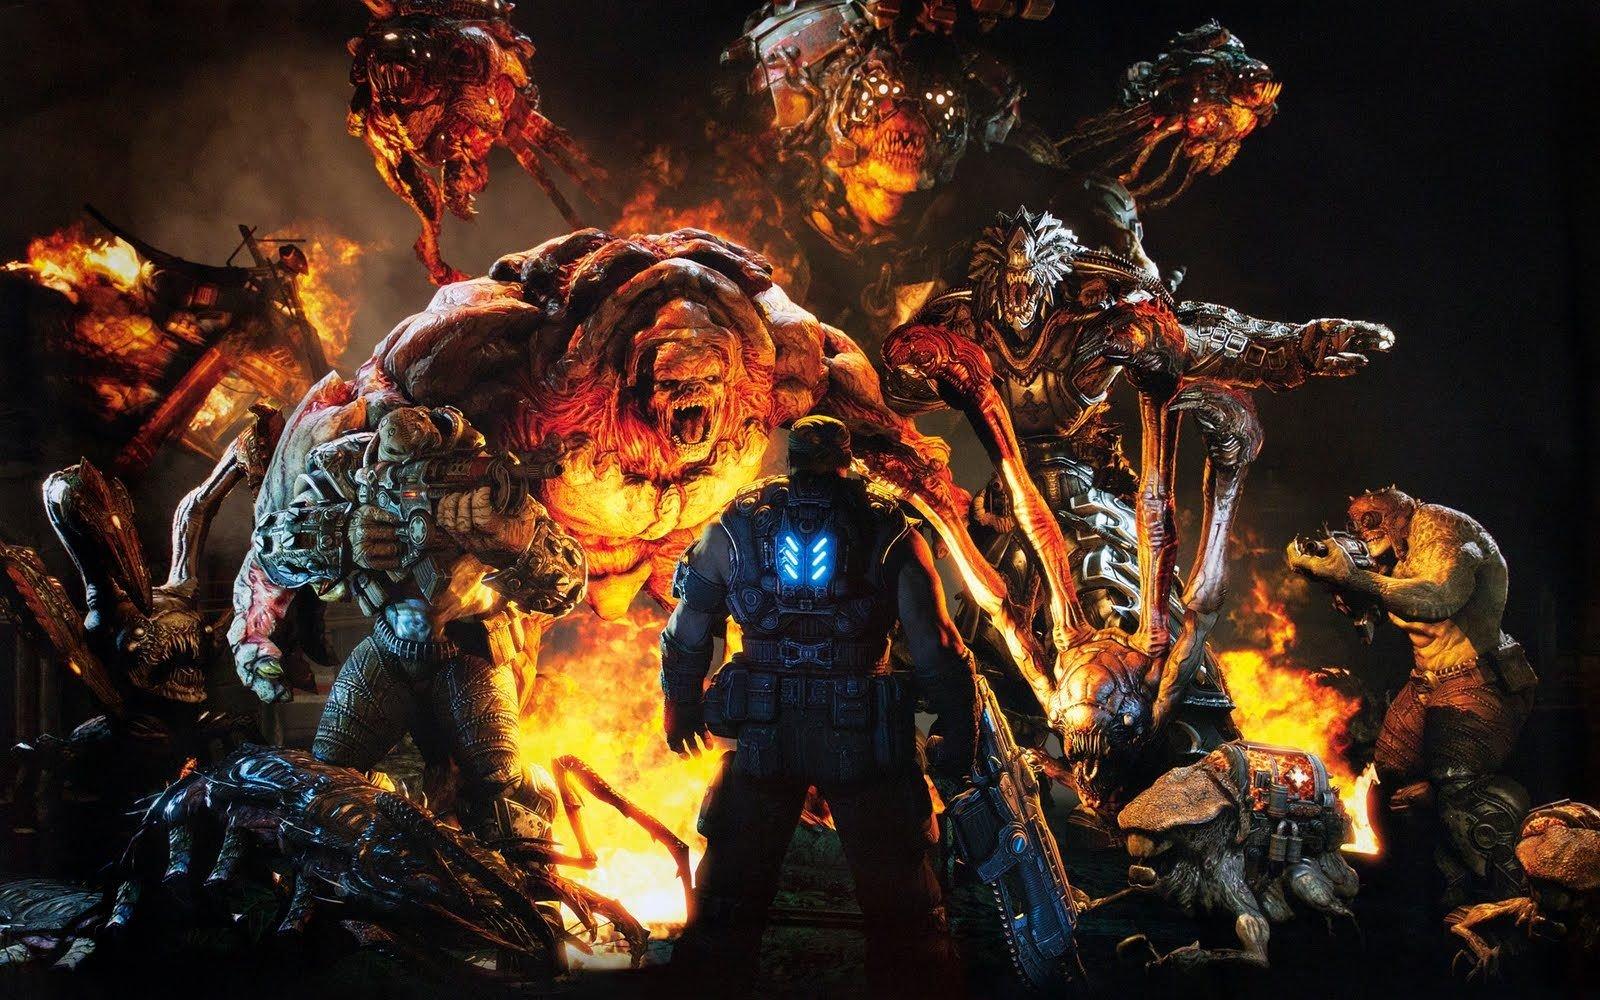 Gears Of War 4 Gets A Release Date 1